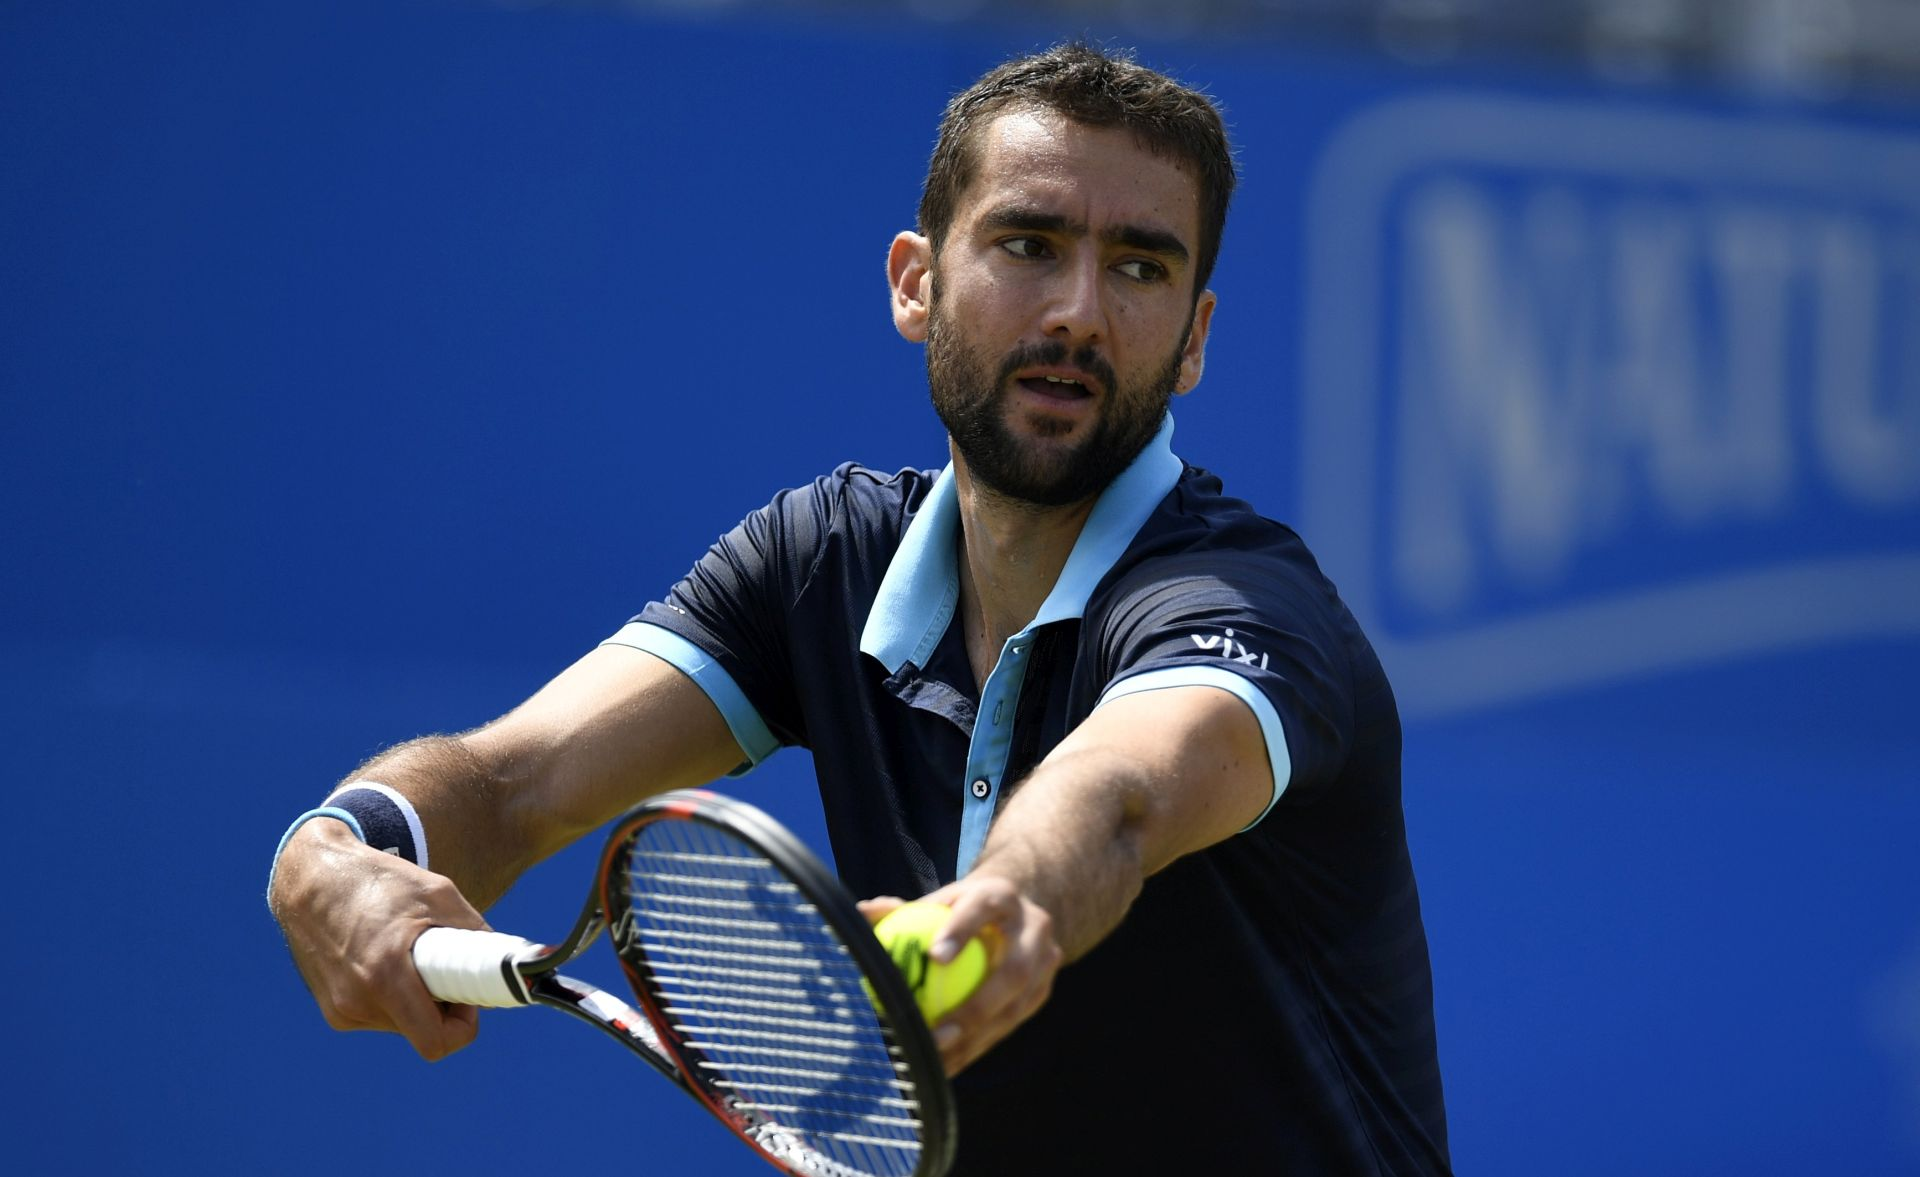 ATP QUEEN'S Čilić u polufinalu